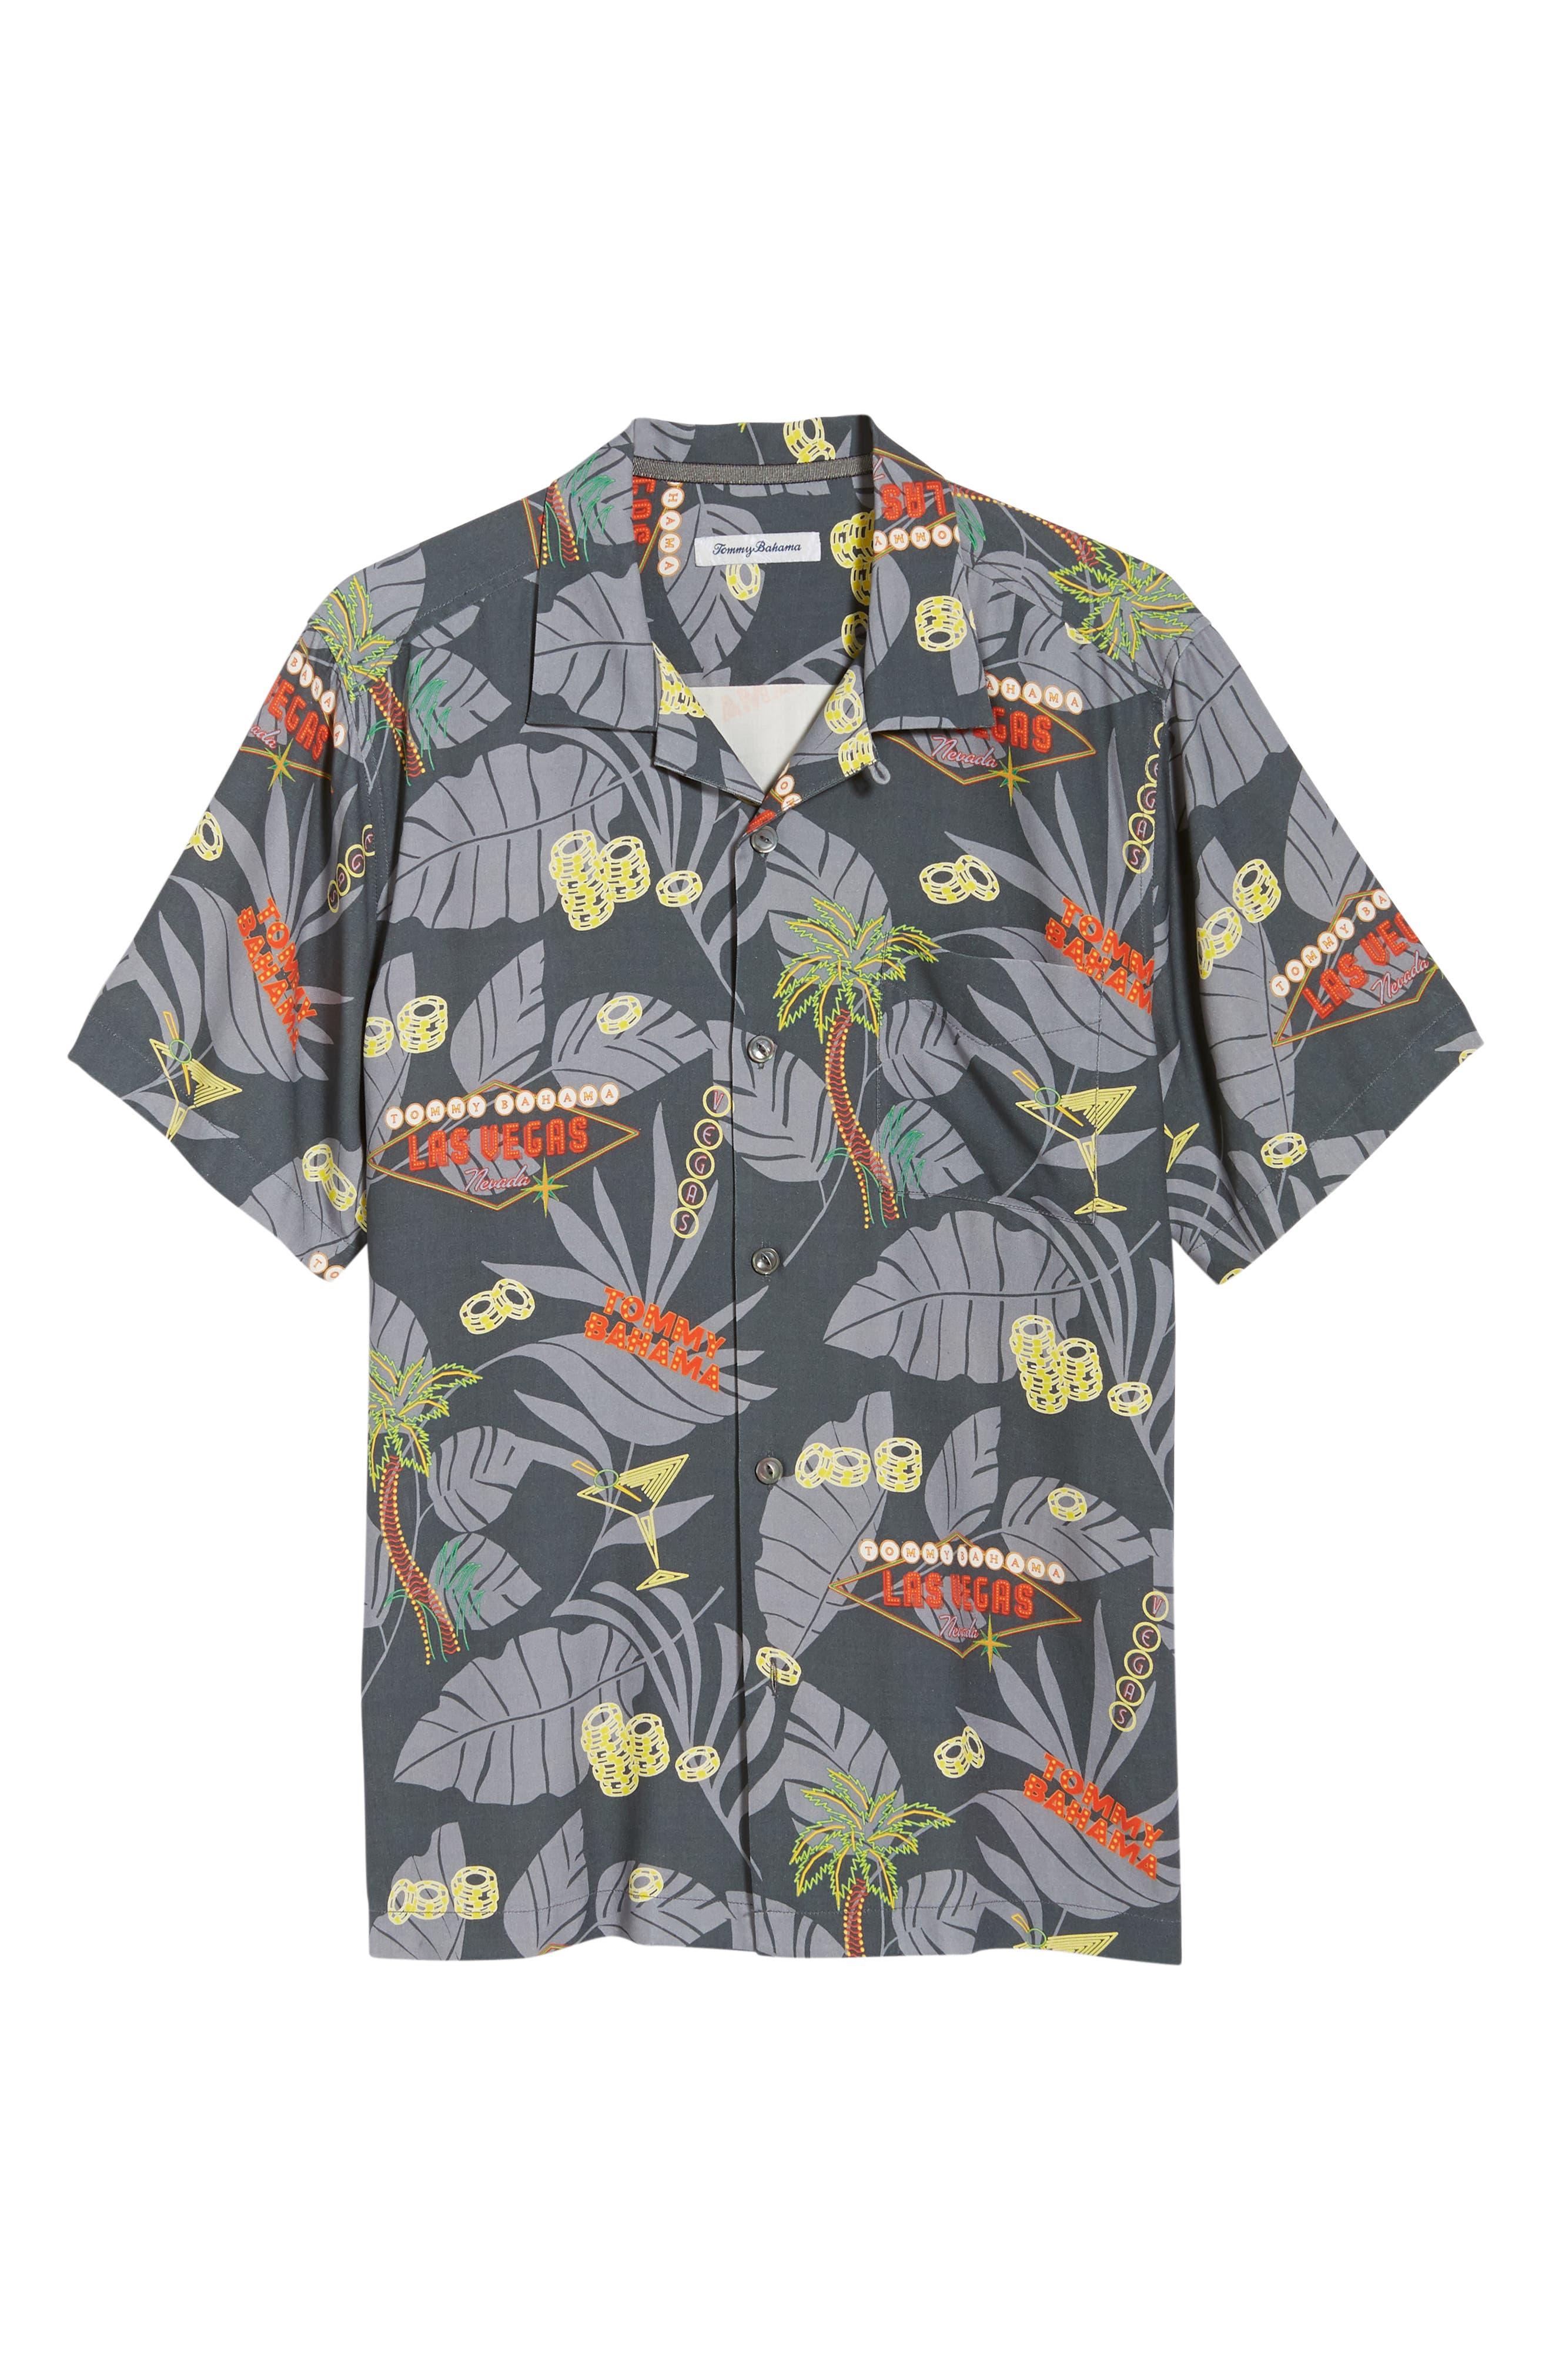 TOMMY BAHAMA,                             Poker in Paradise Silk Camp Shirt,                             Alternate thumbnail 6, color,                             001